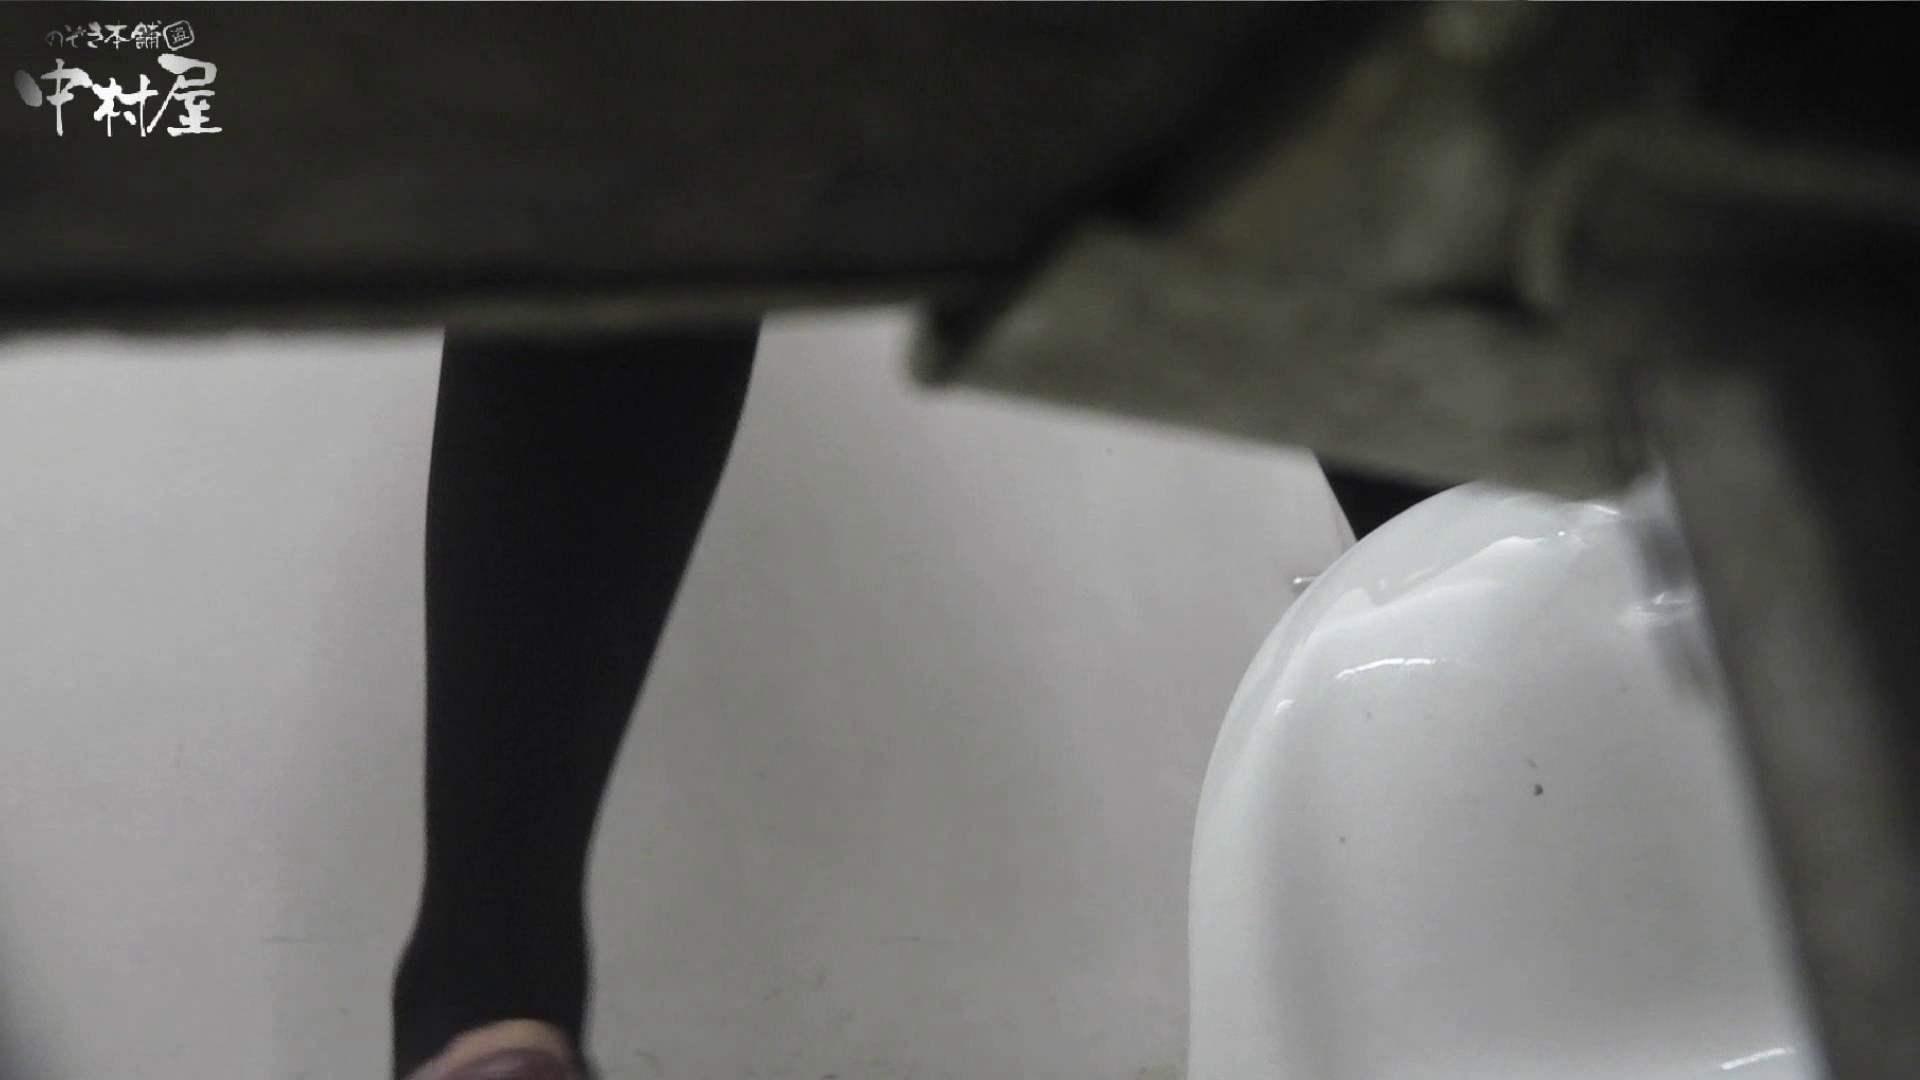 vol.56 命がけ潜伏洗面所! 強力放水清楚ねぃちゃん プライベート ワレメ無修正動画無料 74枚 11